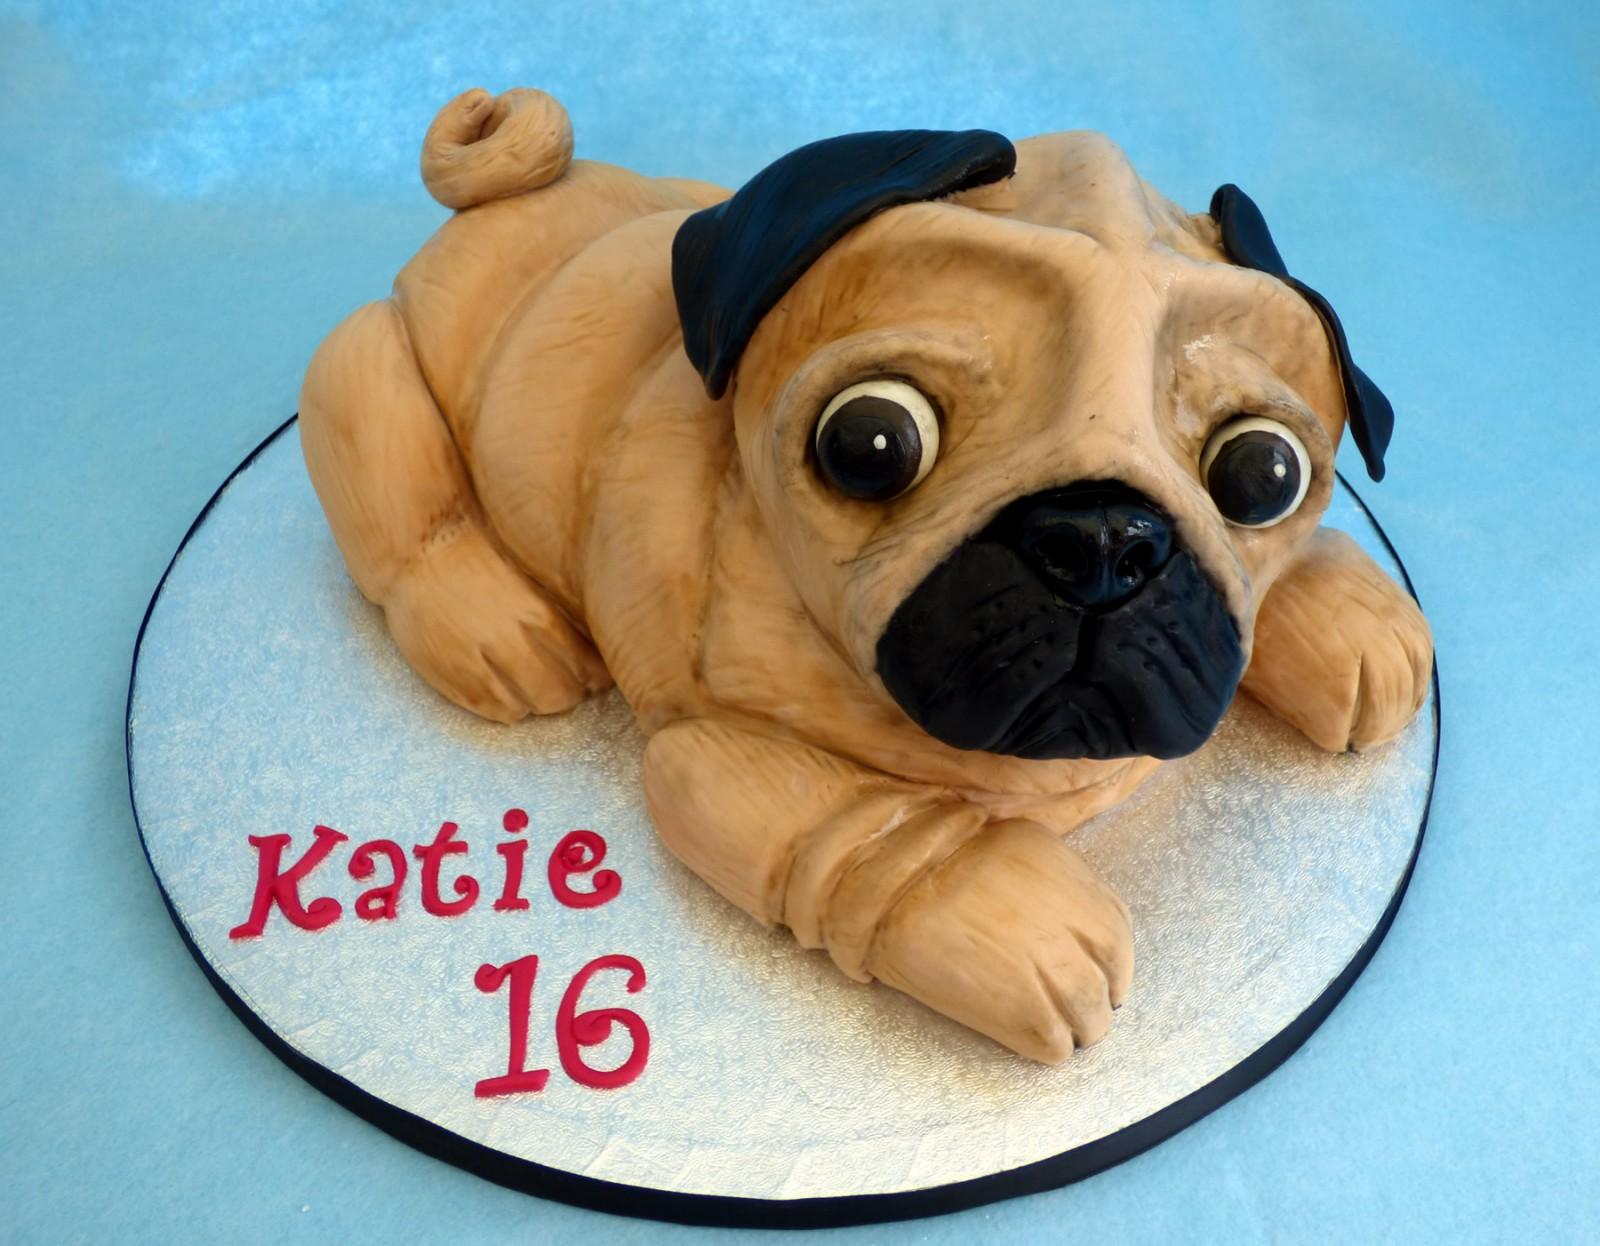 Fantastic Pug Dog Novelty Birthday Cake Susies Cakes Funny Birthday Cards Online Bapapcheapnameinfo